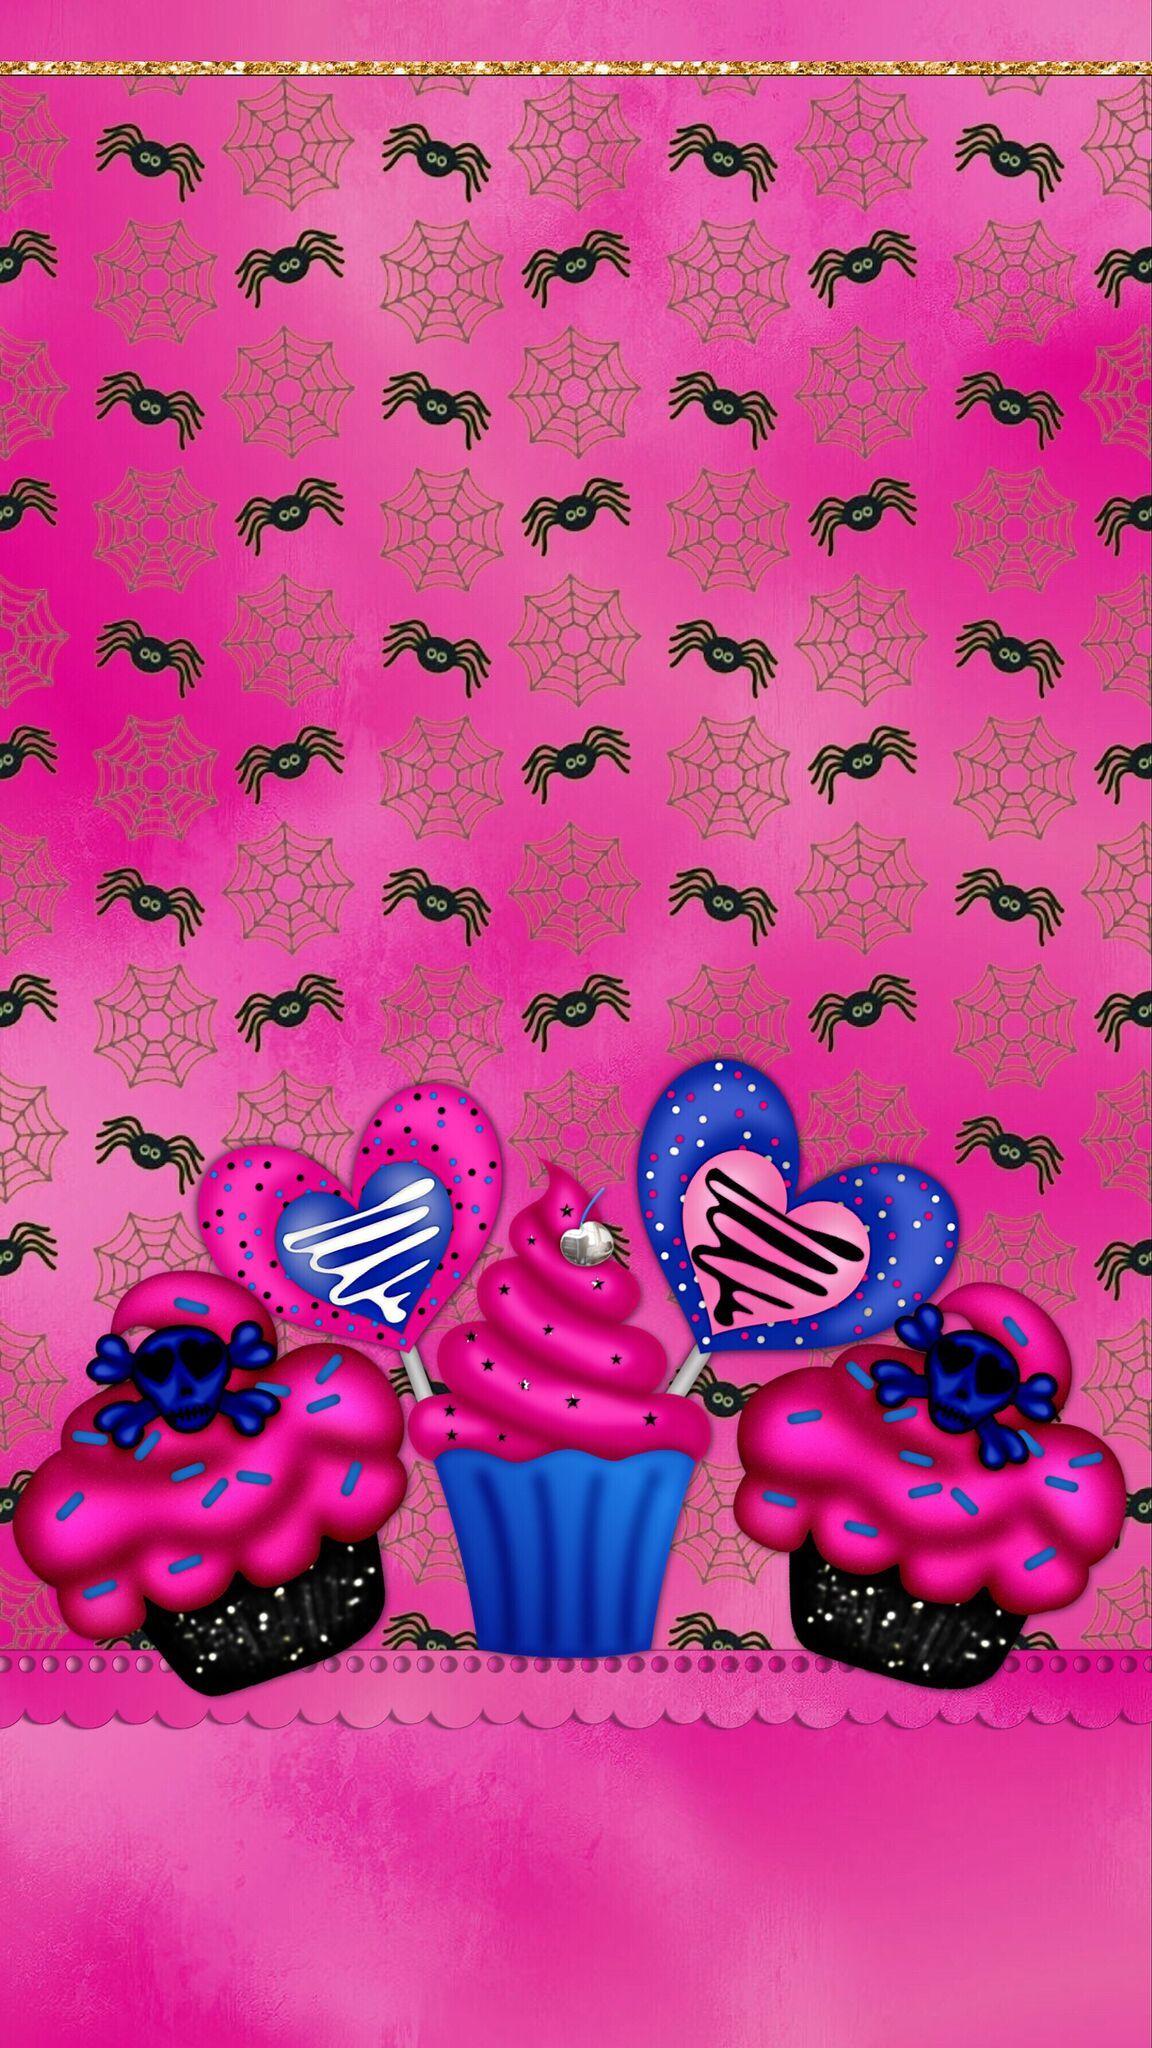 reeseybelle Halloween tjn Iphone 7 wallpaper